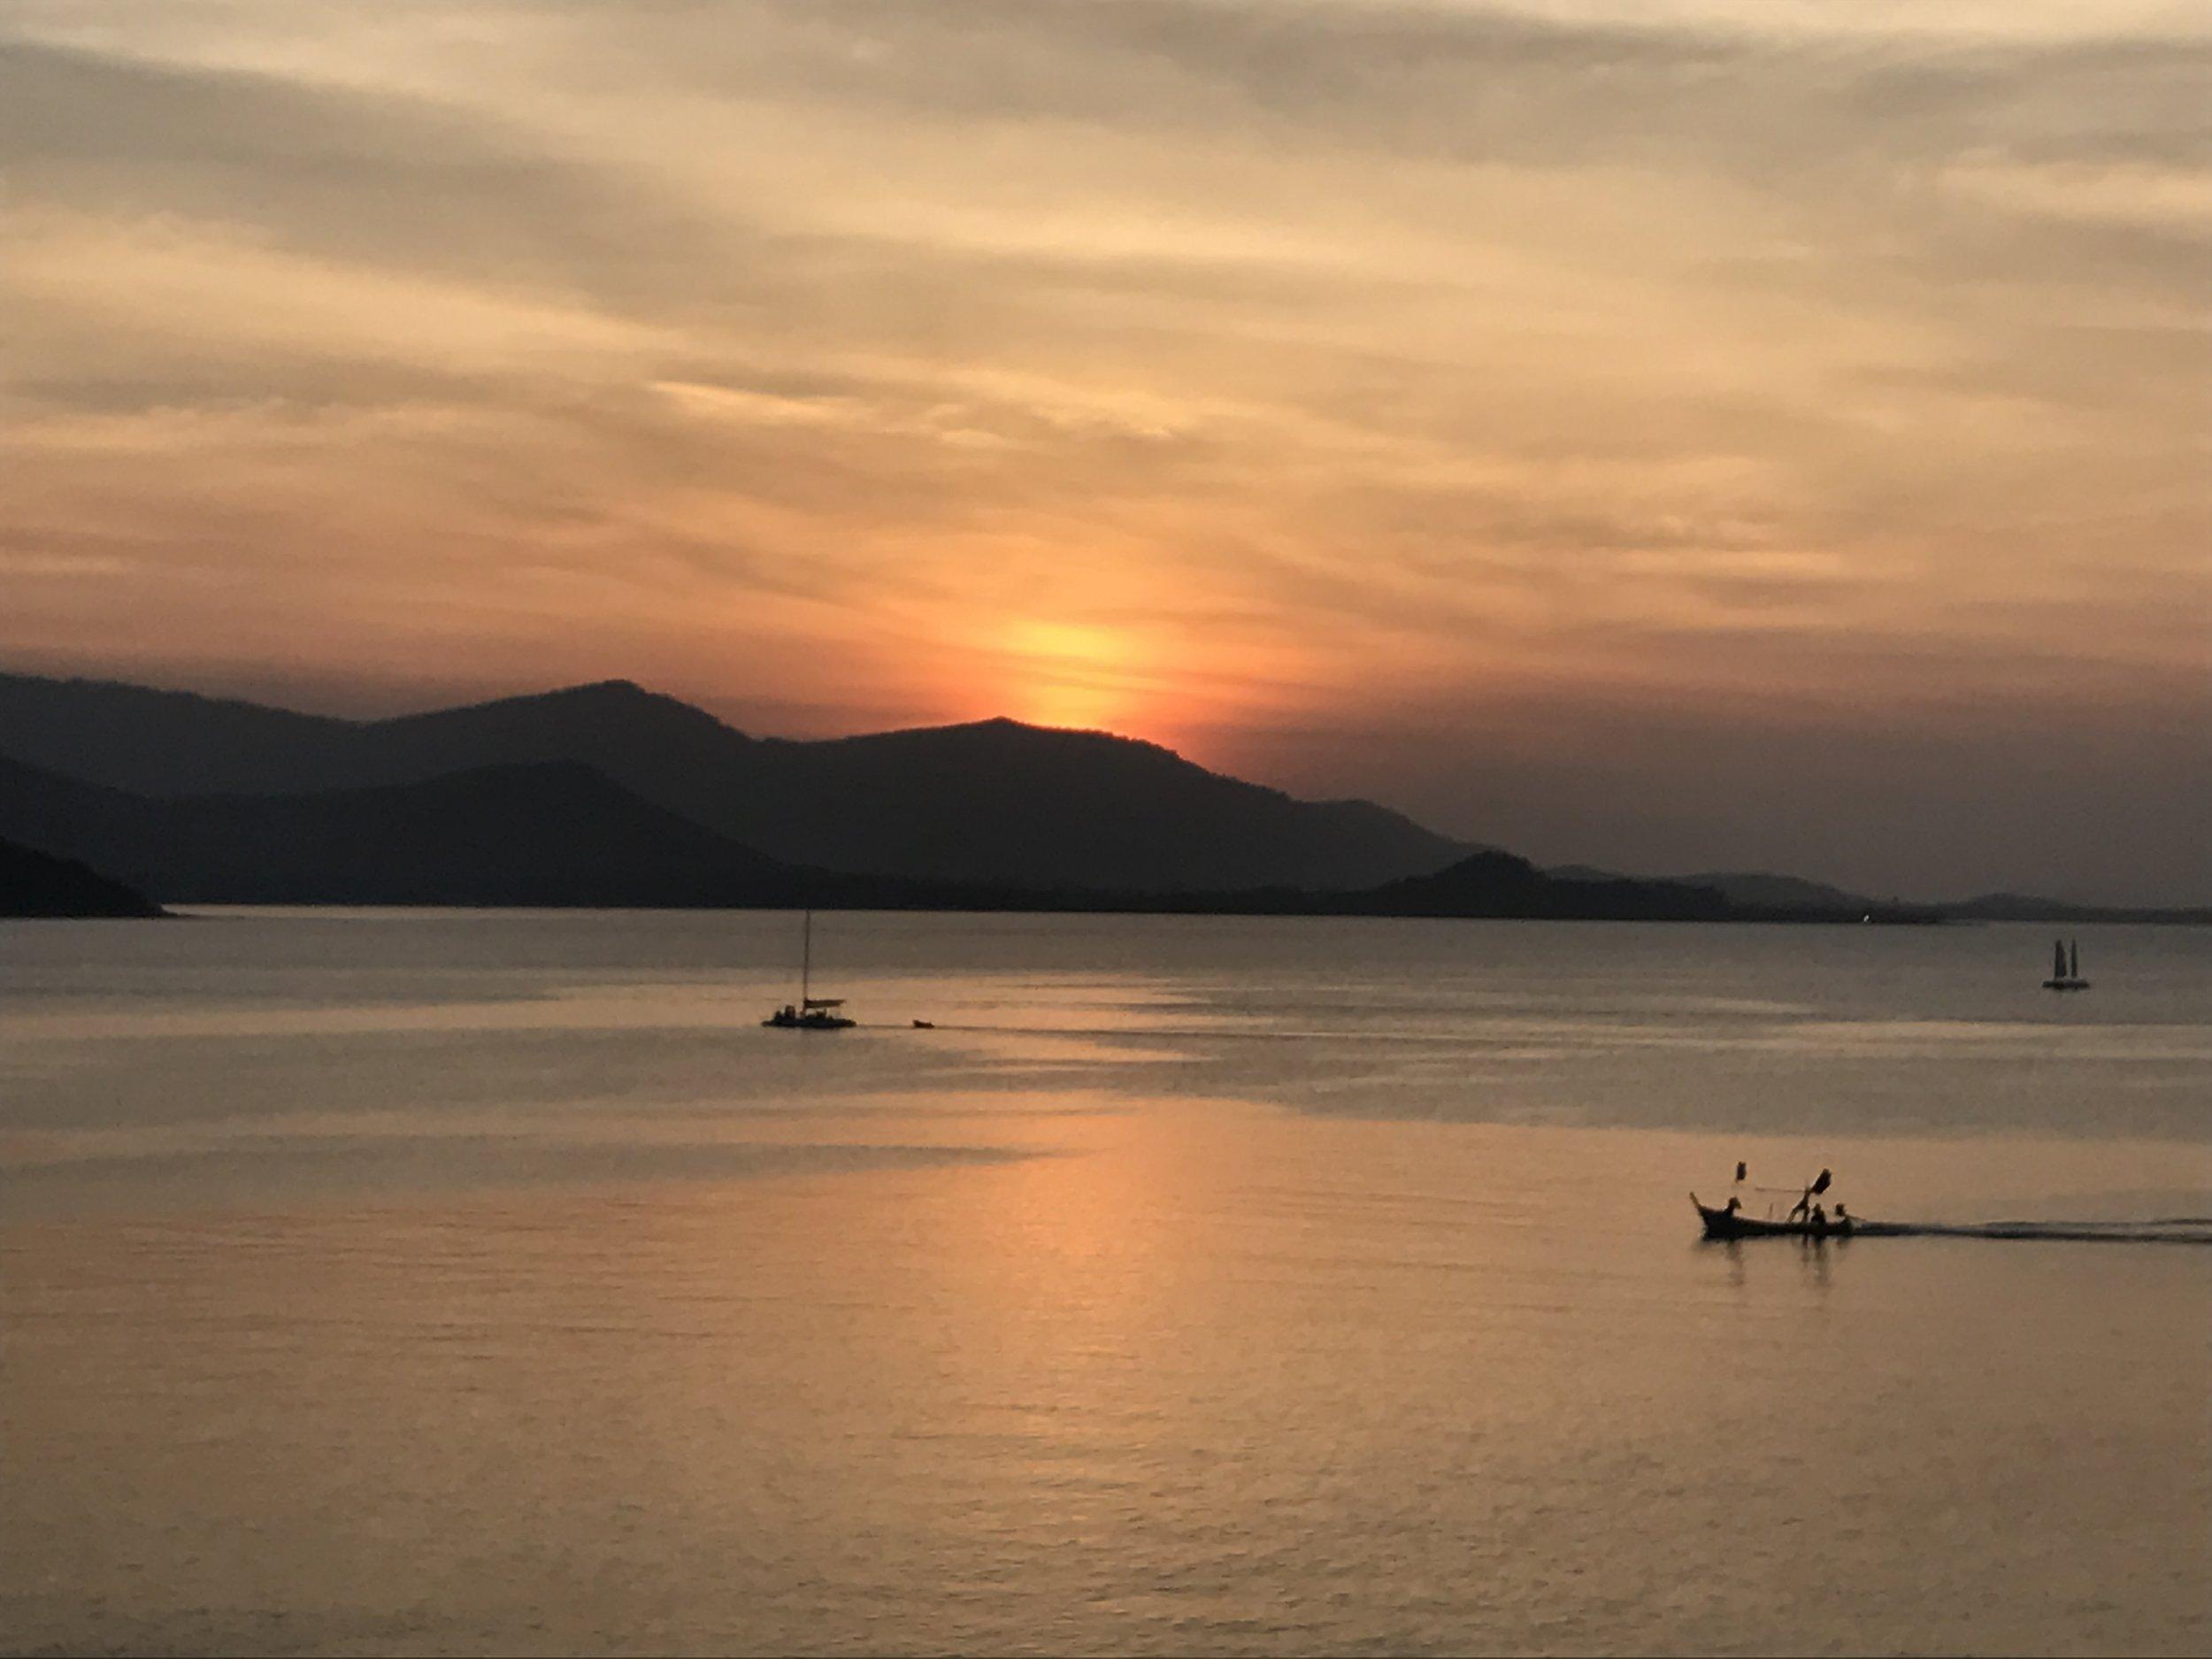 Sunset view from Big Buddha, Koh Samui.